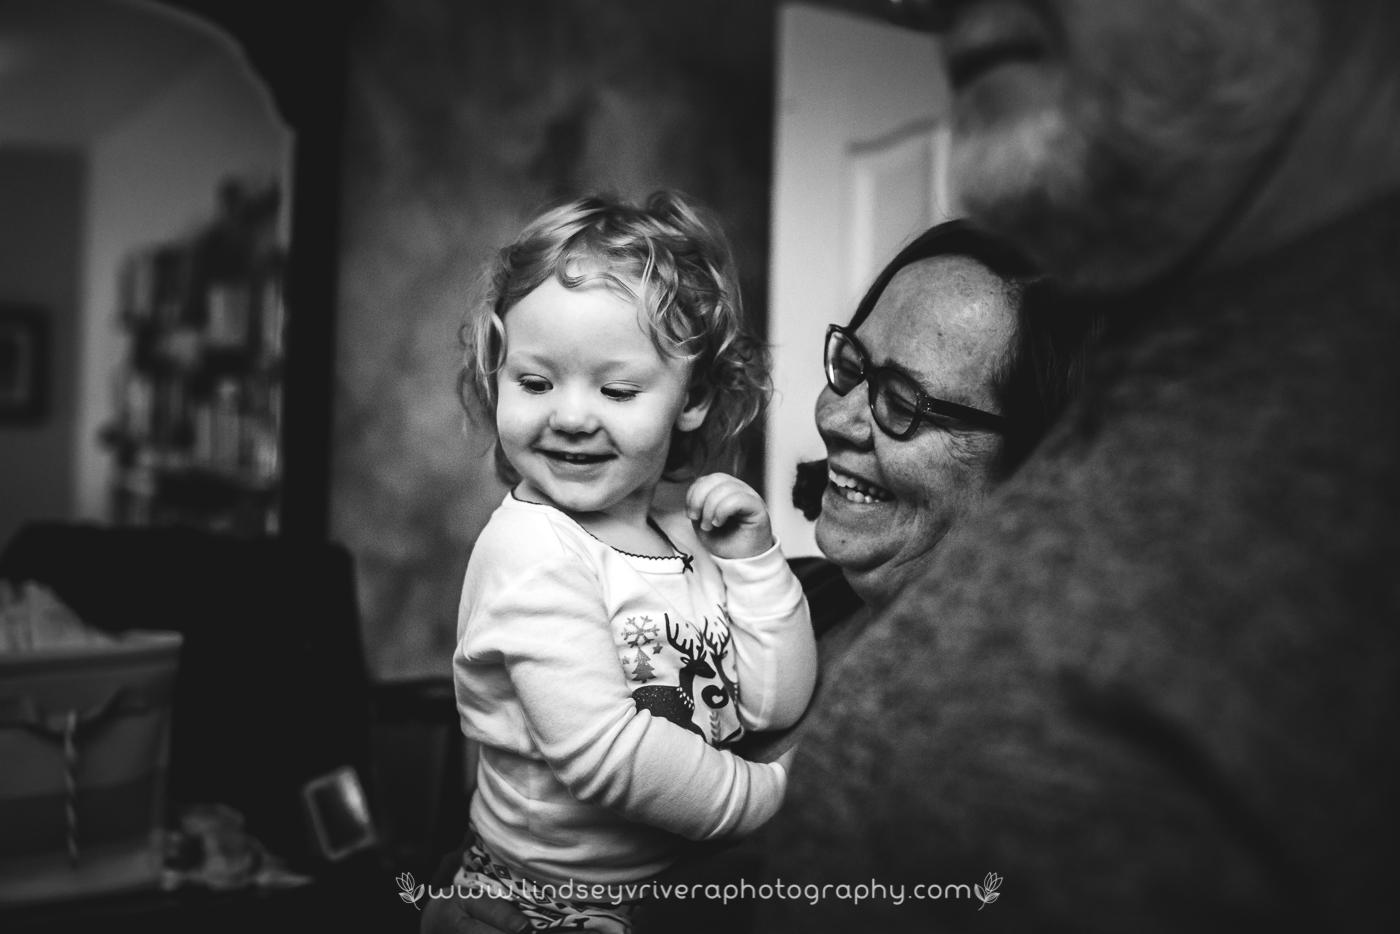 Home-Birth-Born-Photography-Salt-Lake-City,-Wasatch-Midwifery-&-Wellness,-Just-Born21.jpg